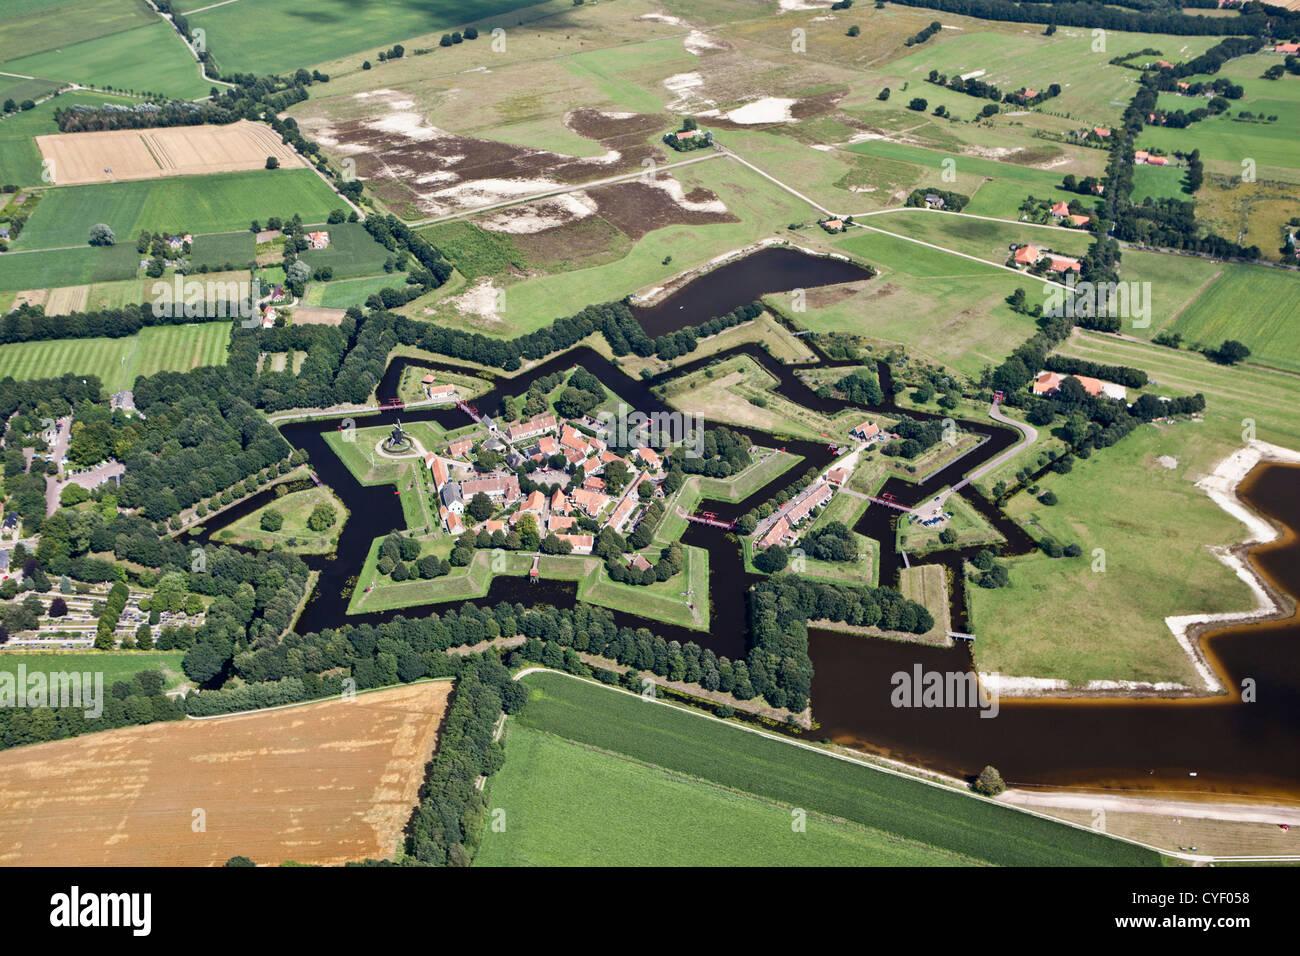 The Netherlands, Vlagtwedde. The fortified, star shaped village of Fort Bourtange. Aerial. - Stock Image